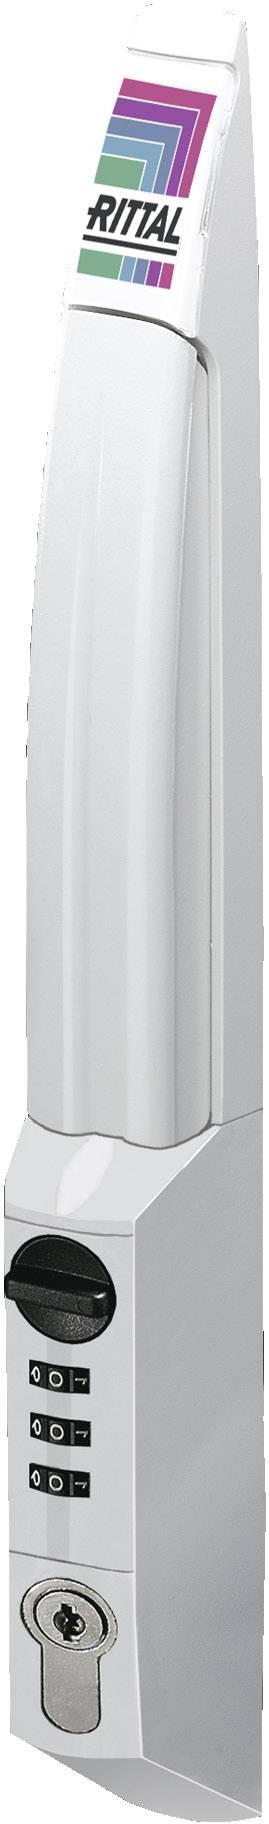 Bezpečnostní rukojeť Rittal DK 7200.800, s číselným kódem šedá (RAL 7035), 1 ks